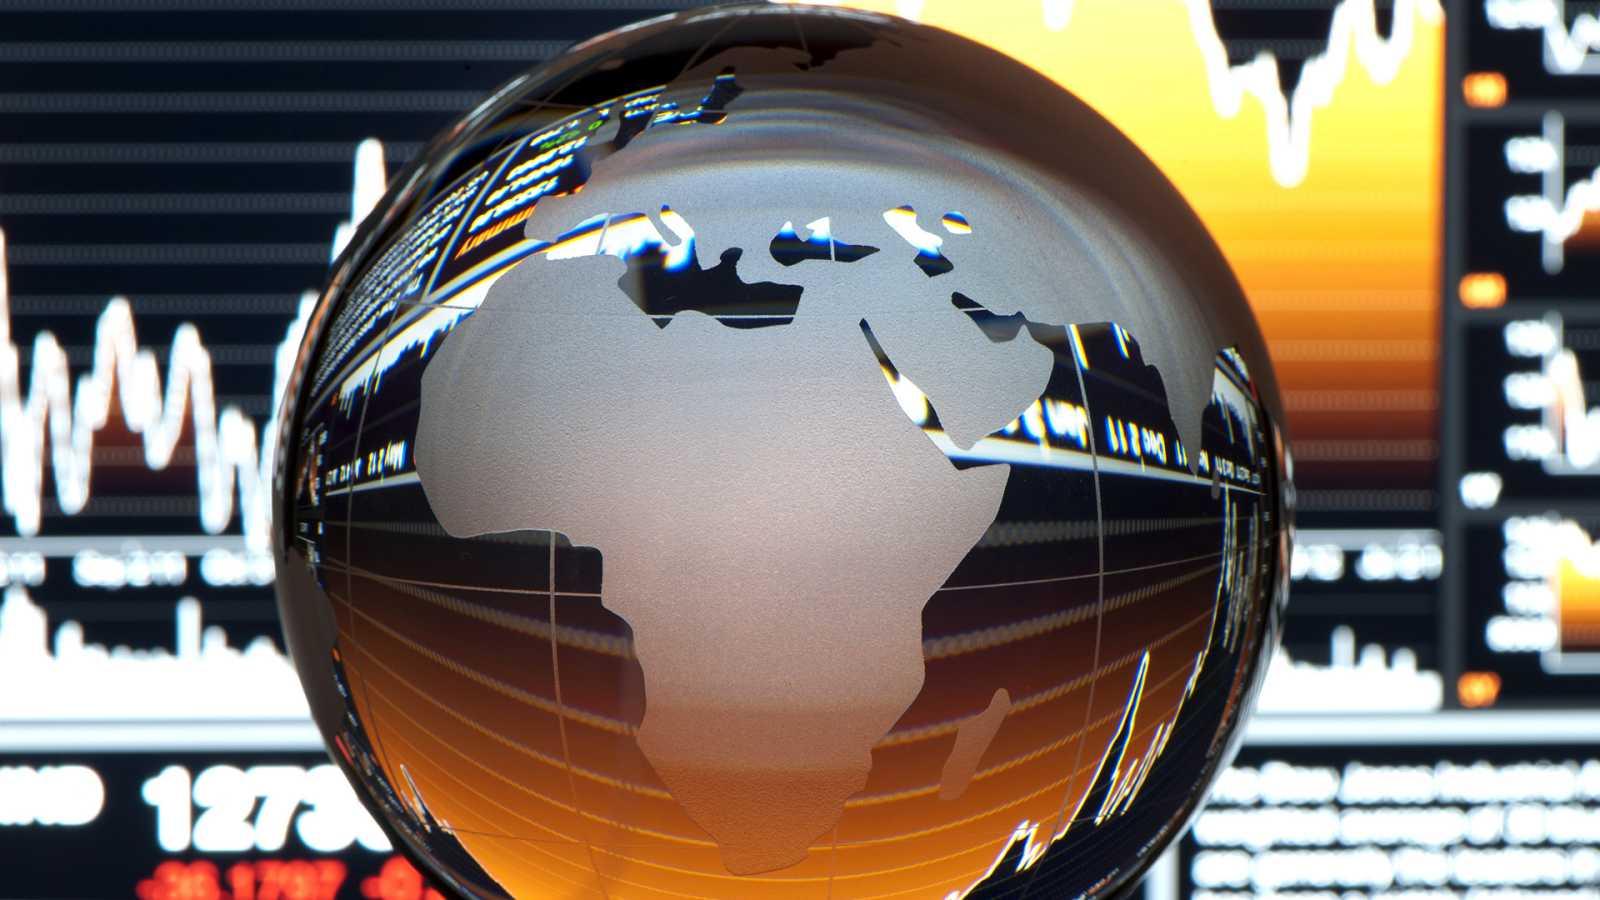 África hoy - África Oriental: oportunidades de negocio para empresas españolas - 25/11/20 - escuchar ahora